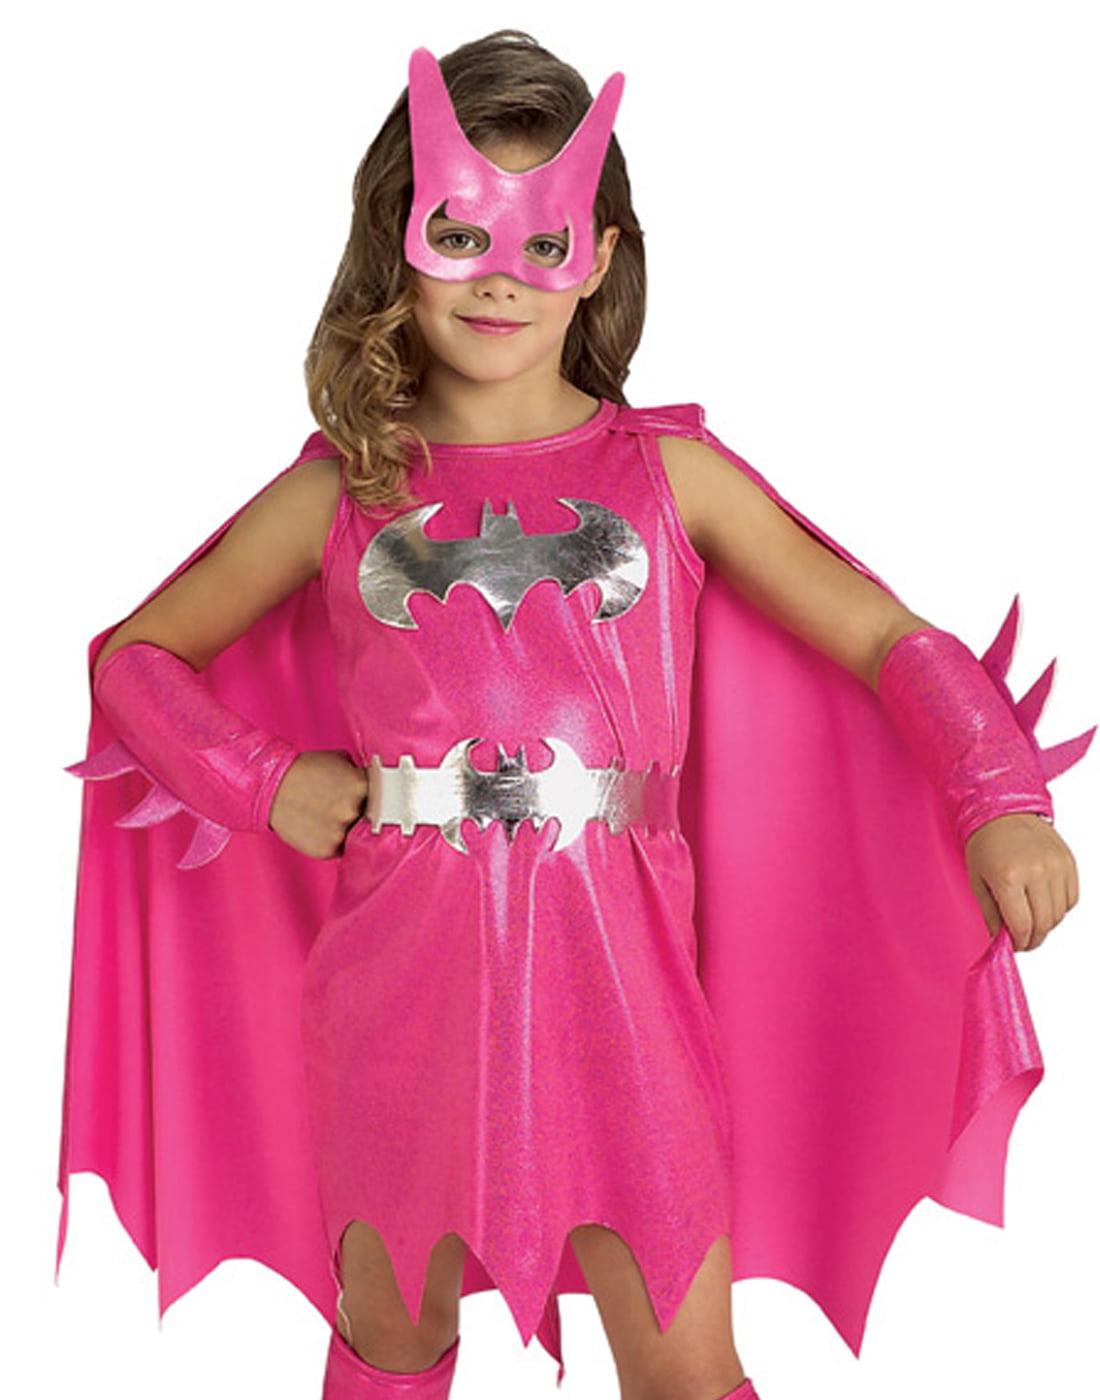 sc 1 st  Walmart & Pink Batgirl Child Halloween Costume - Walmart.com